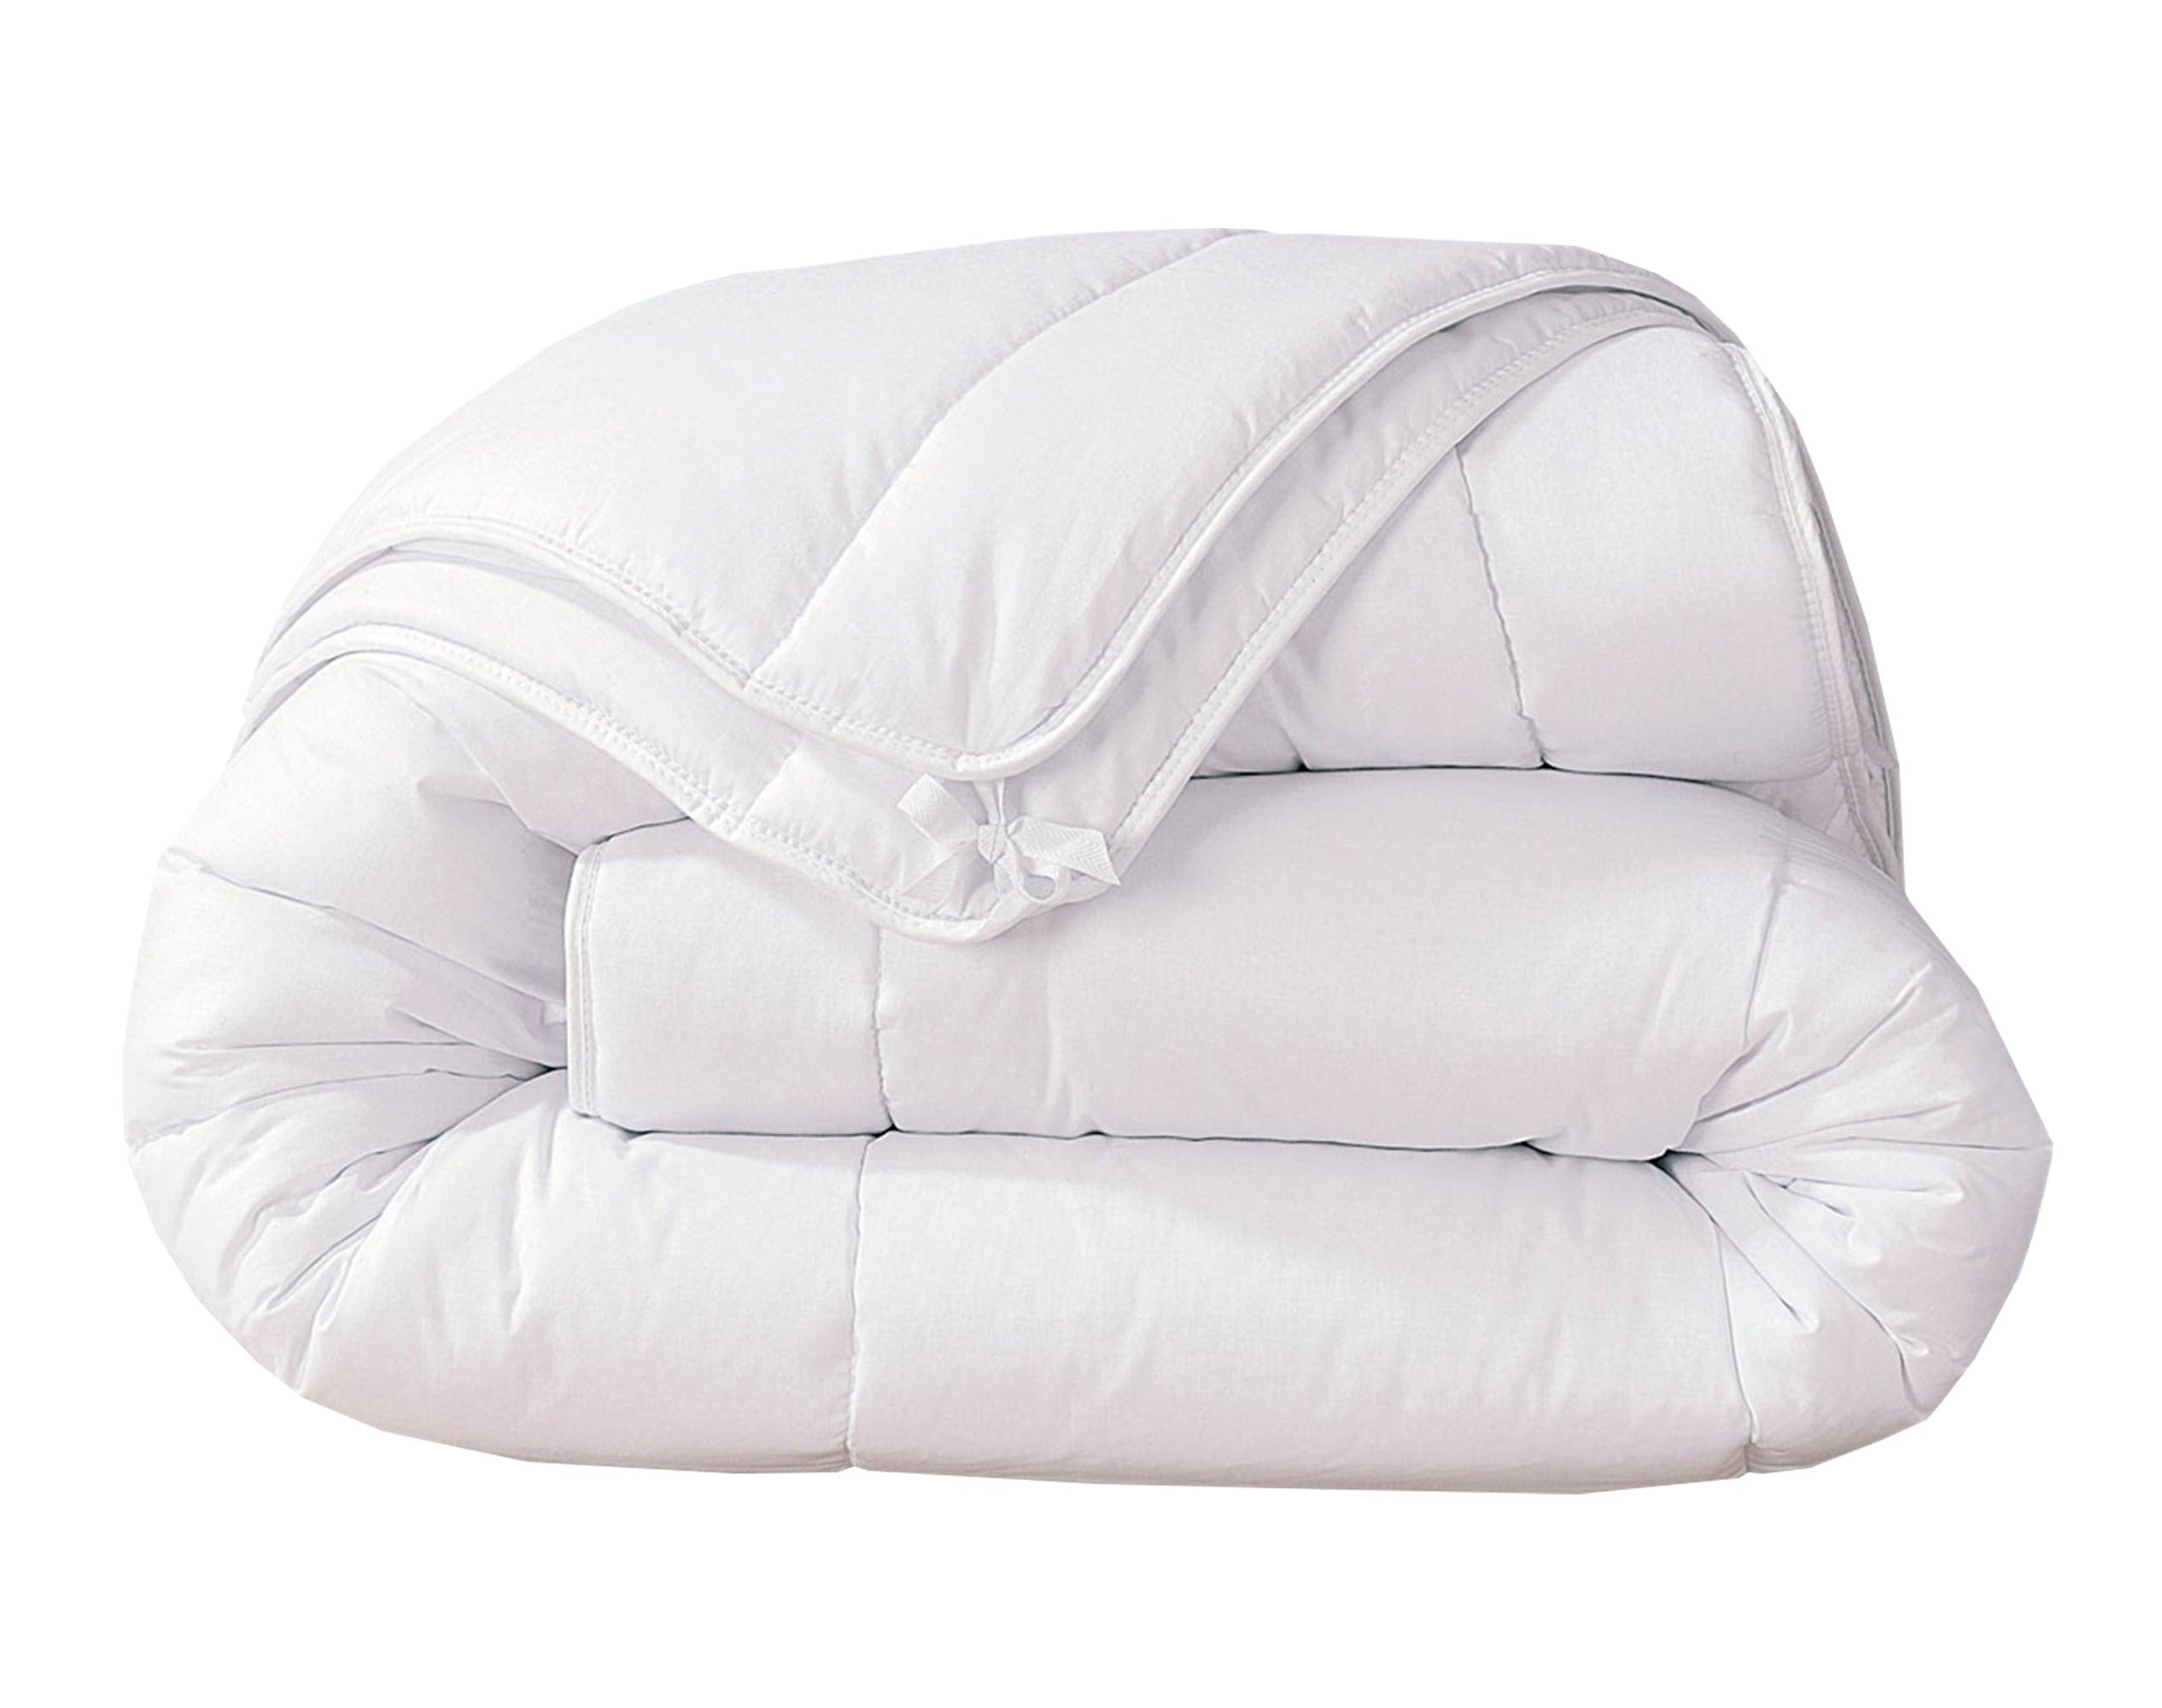 Couette 4 saisons 200x200 blanche en polyester 200+300 g/m²